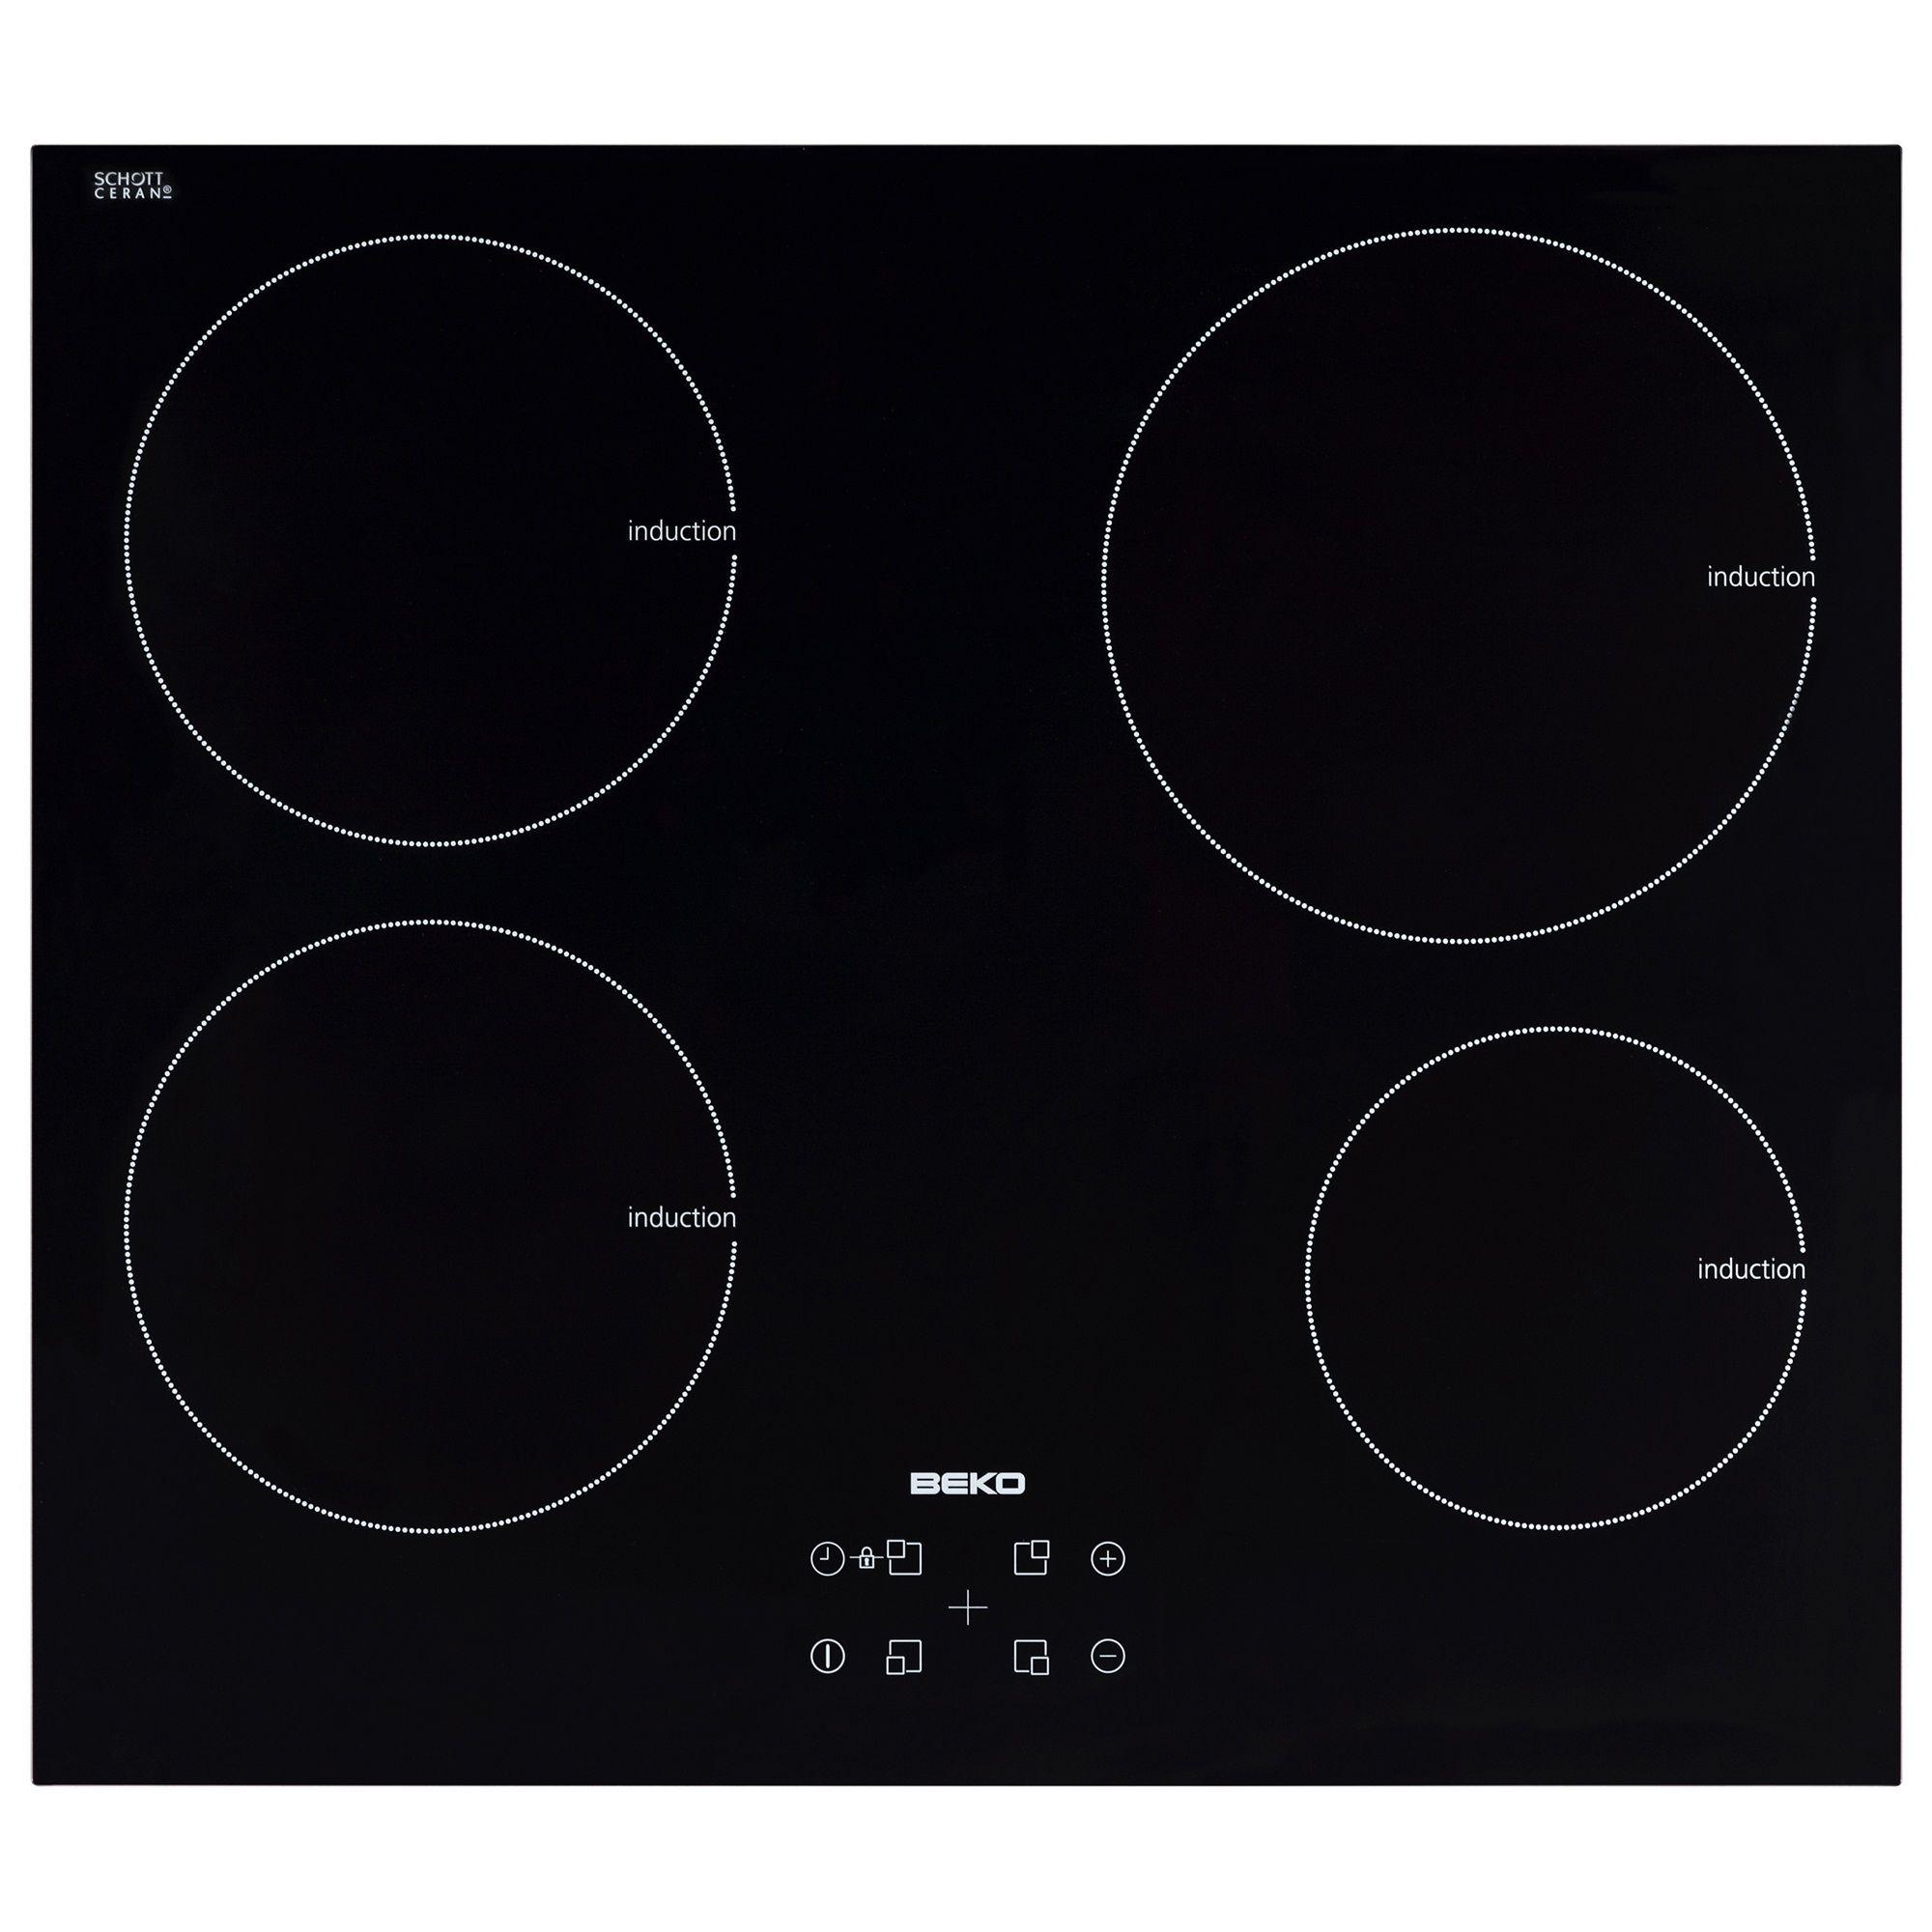 Plita incorporabila Beko HII64400AT, Inductie, 4 Zone, 60 cm, Sticla neagra